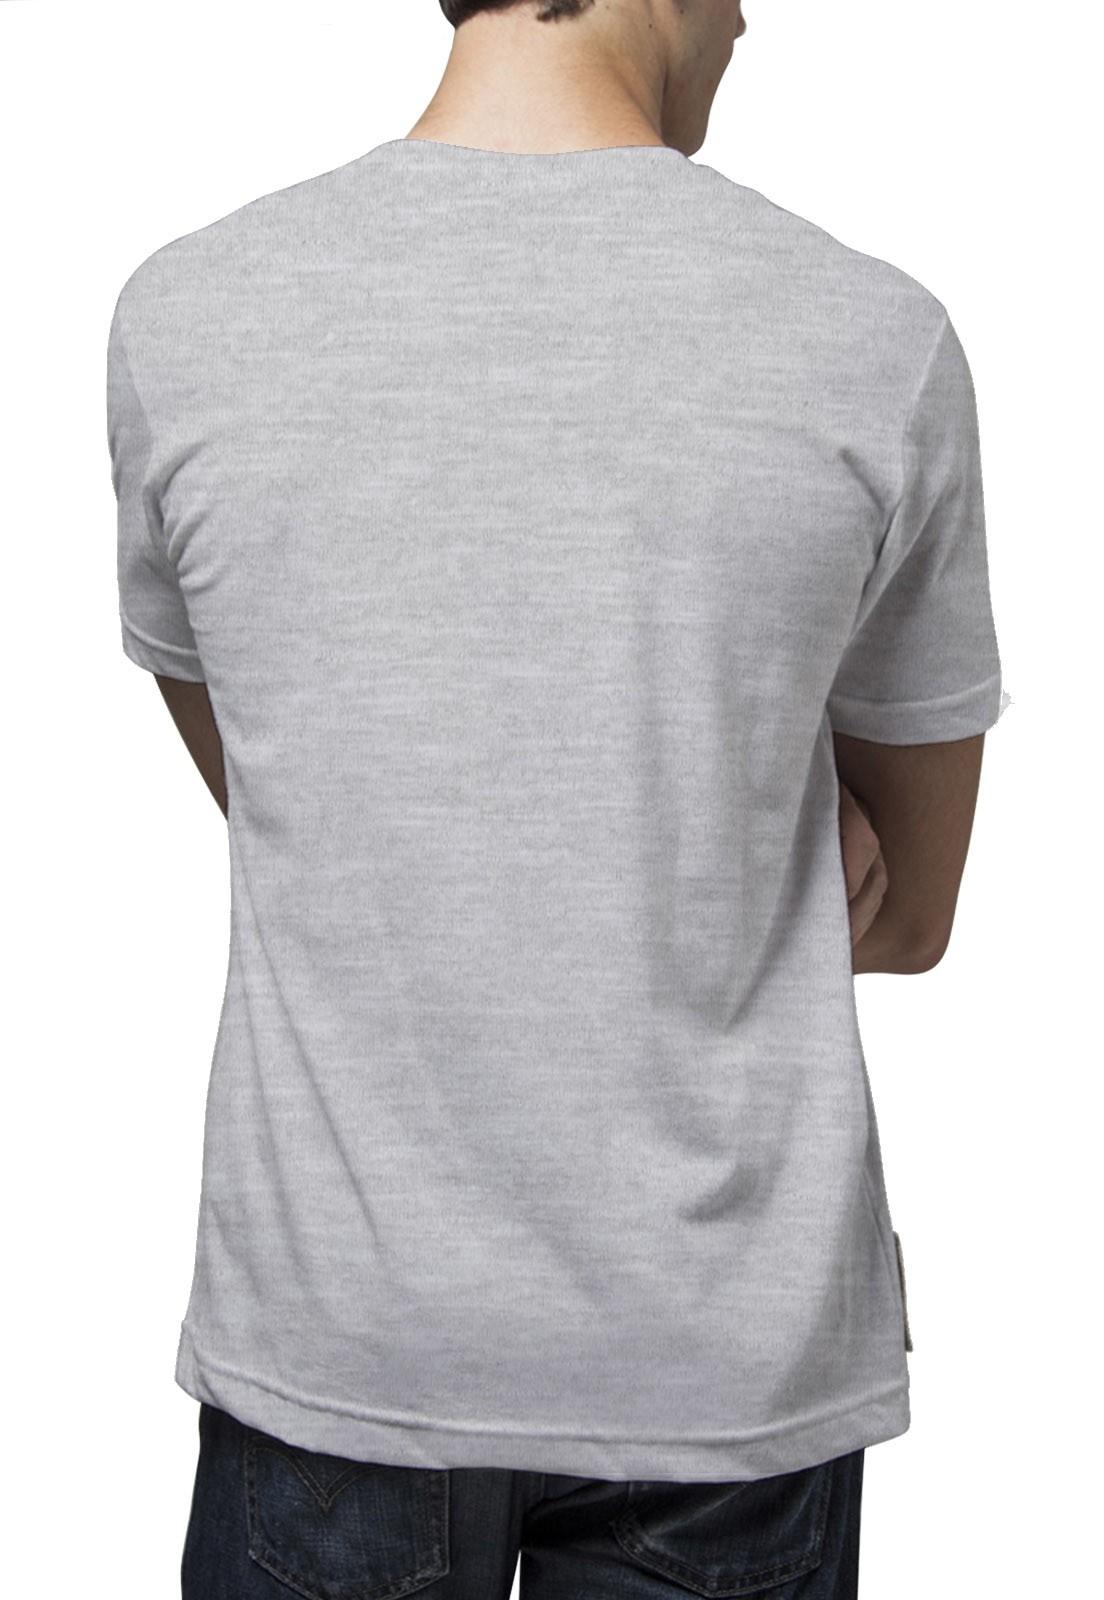 Camiseta Amazônia Kombi - Mescla Claro